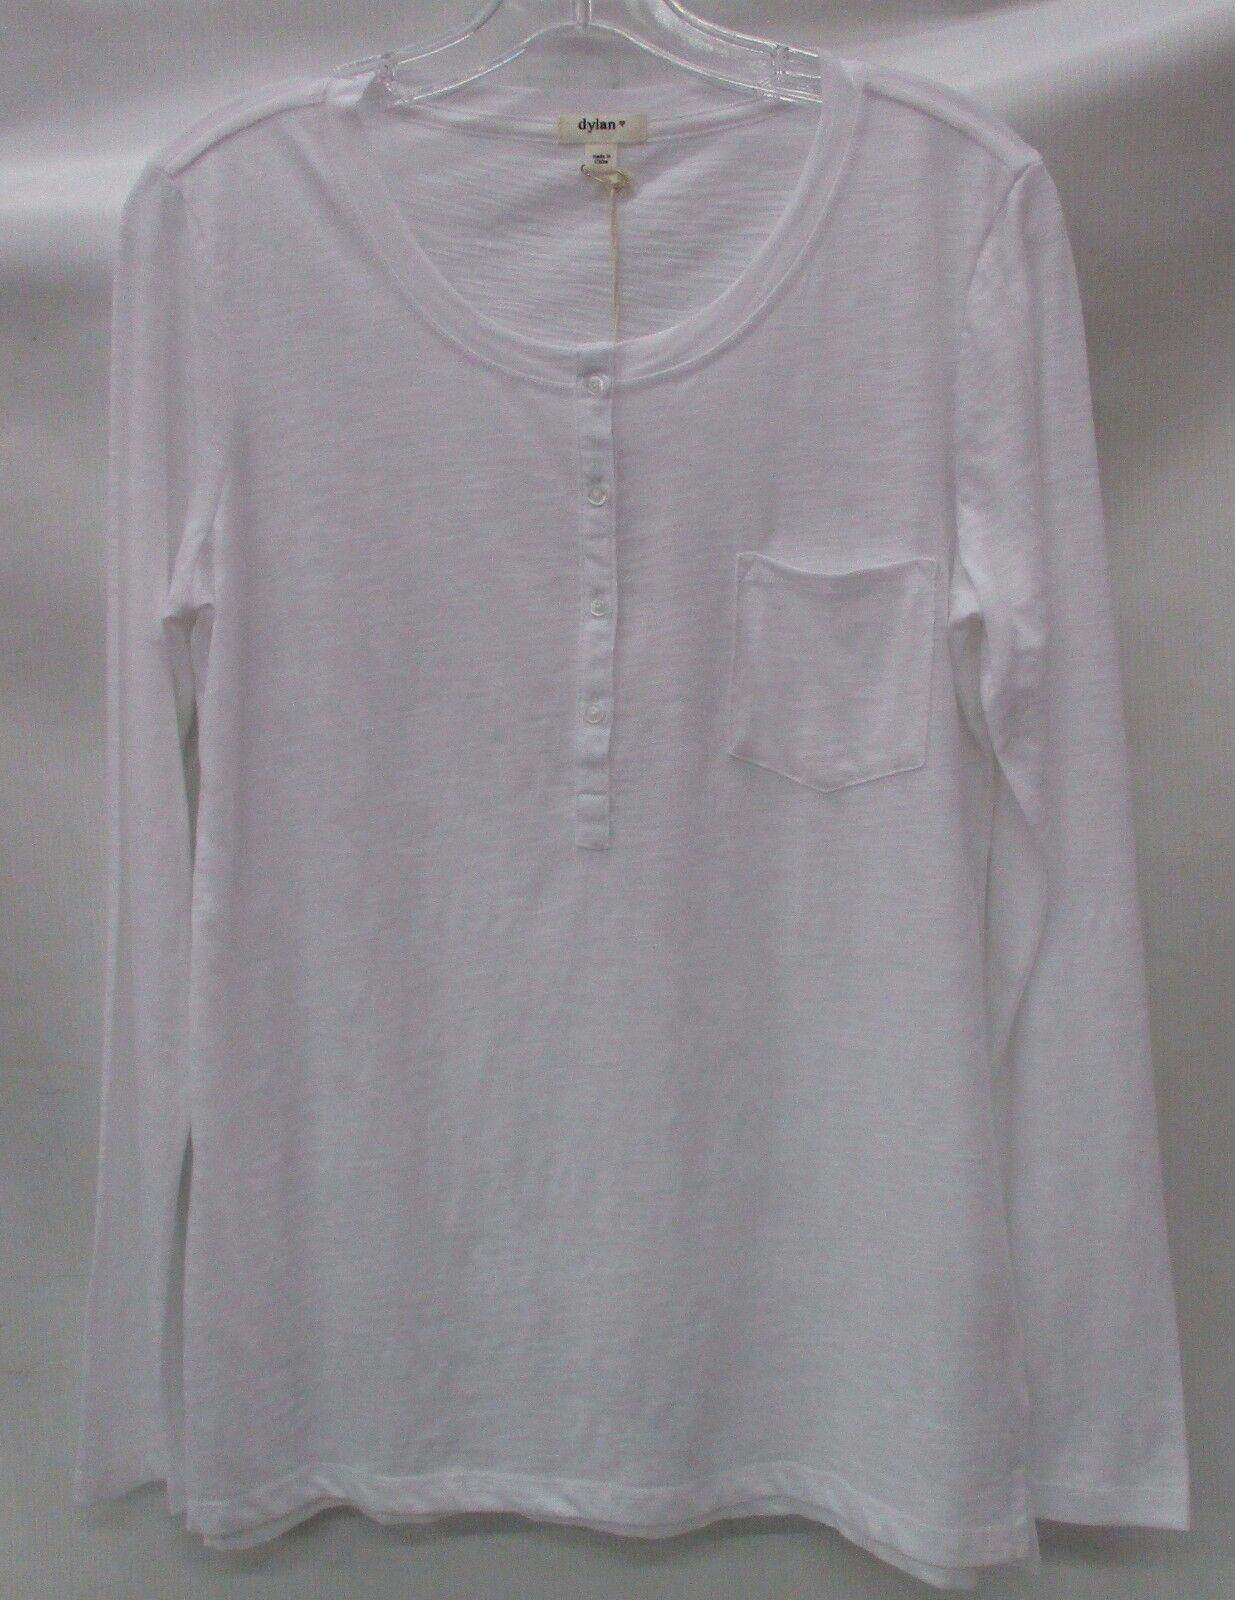 Dylan damen Slub L S Pocket Henley Shirt 71W47GC Weiß Größe Large